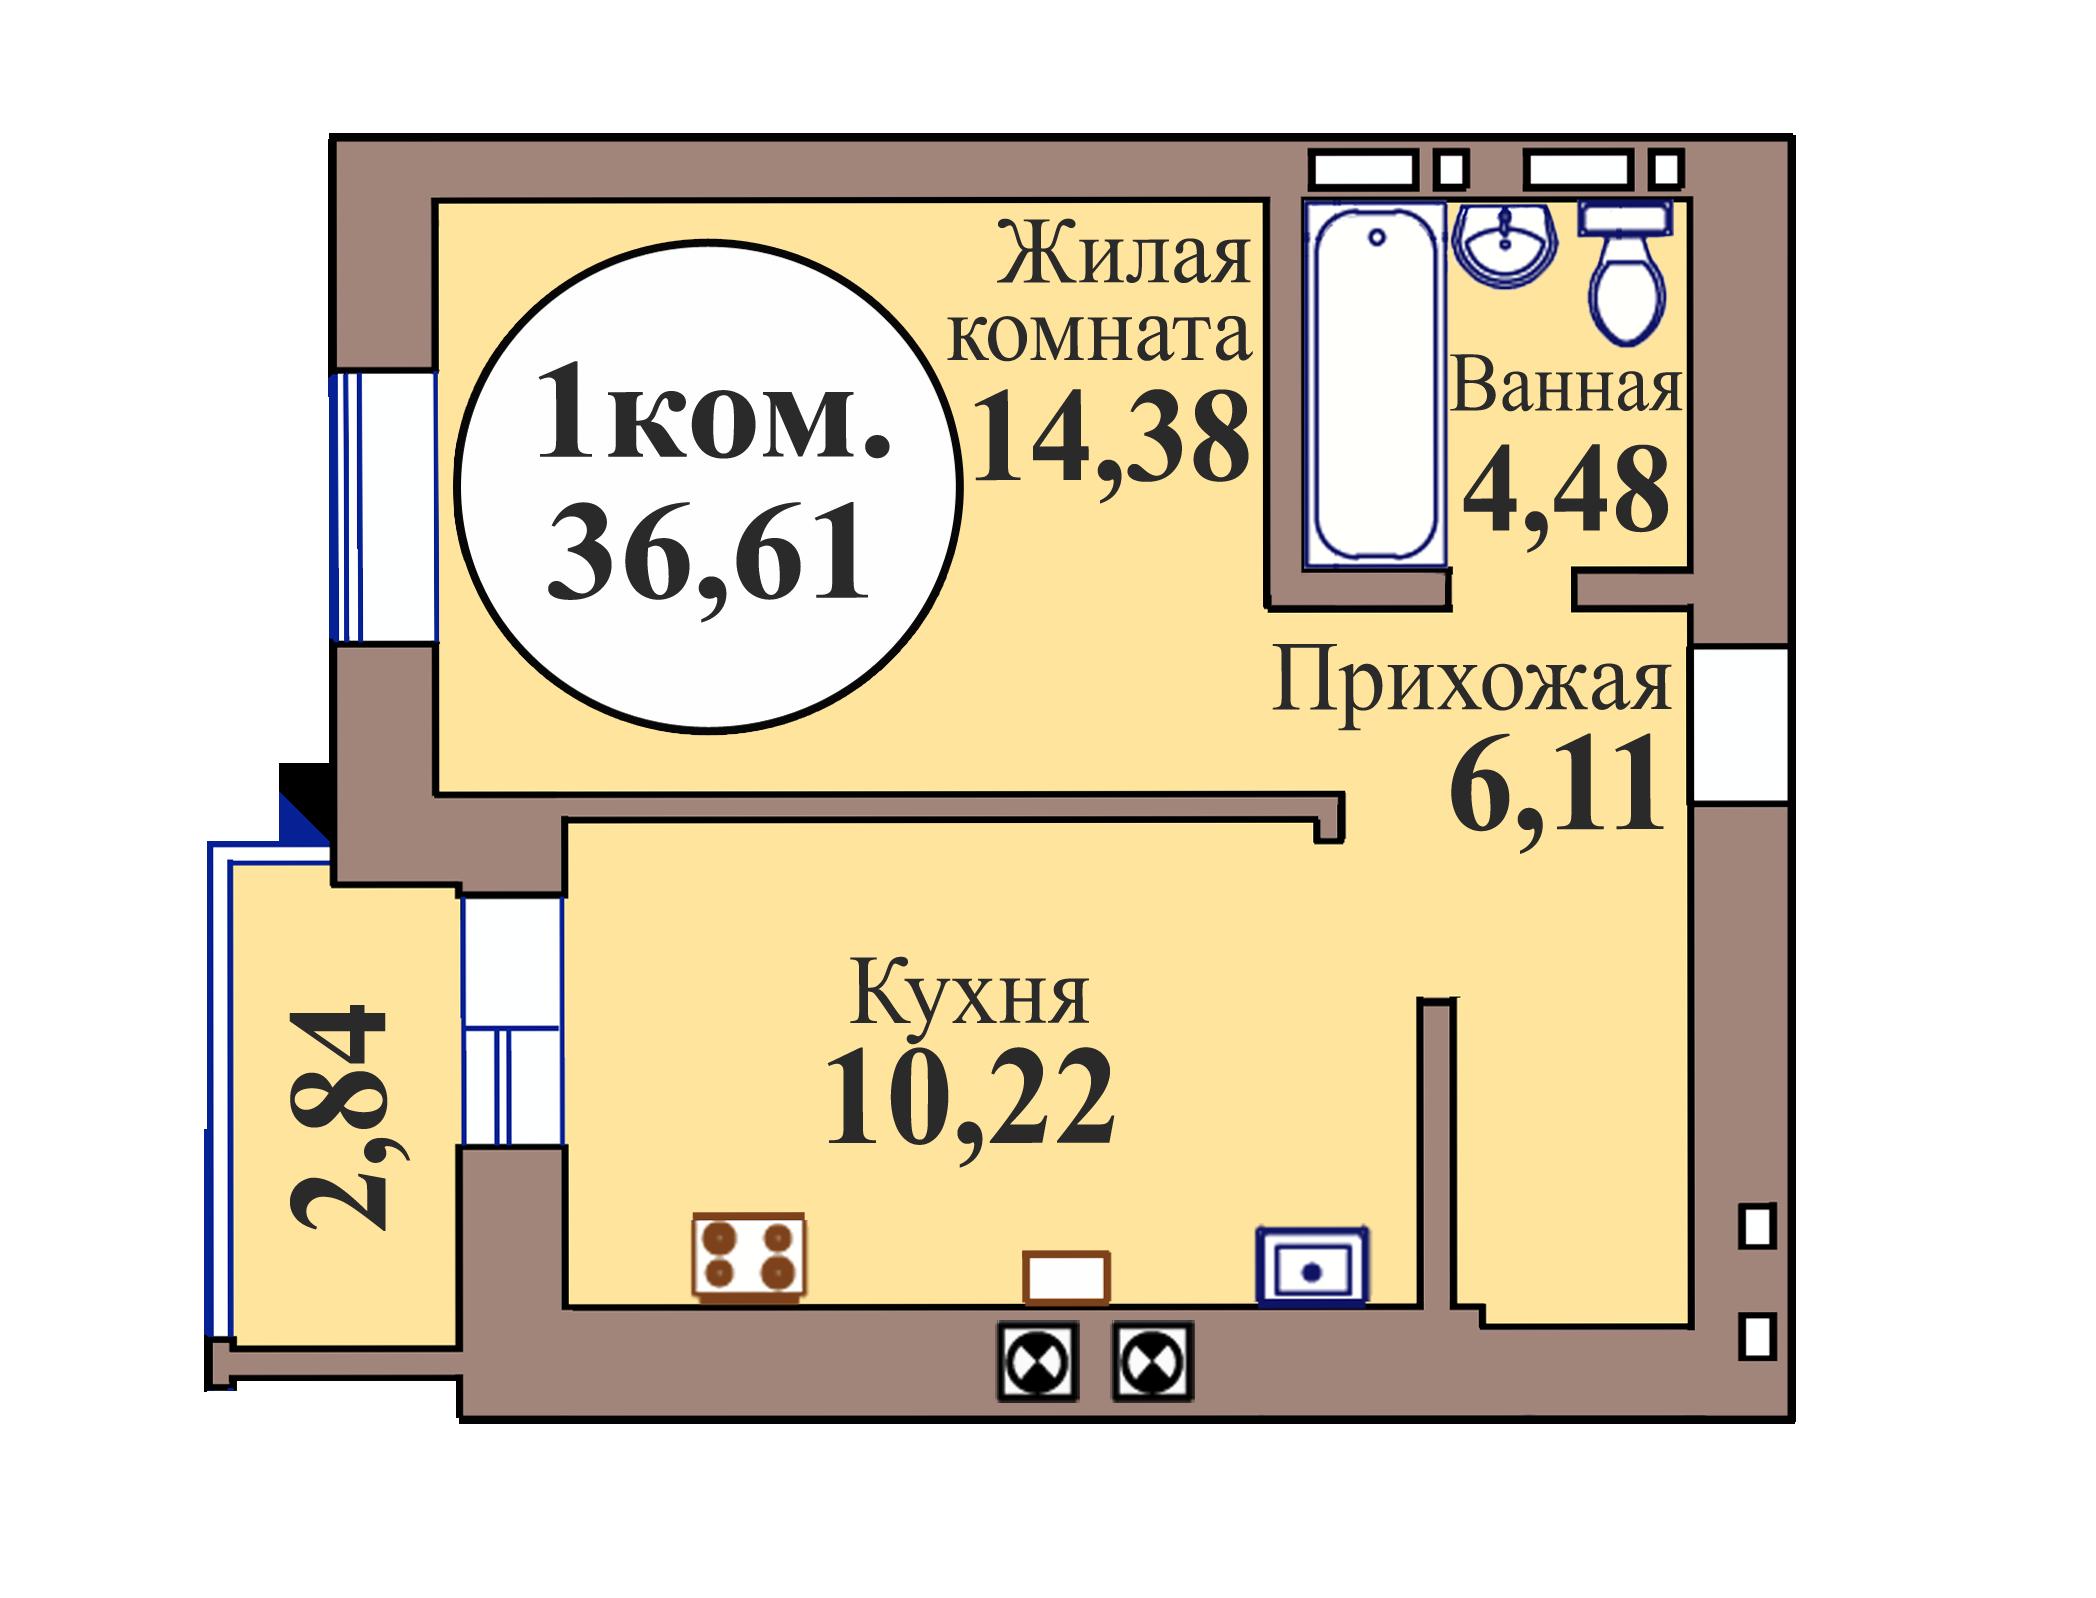 1-комн. кв. по пер. Калининградский, 5 кв. 172 в Калининграде